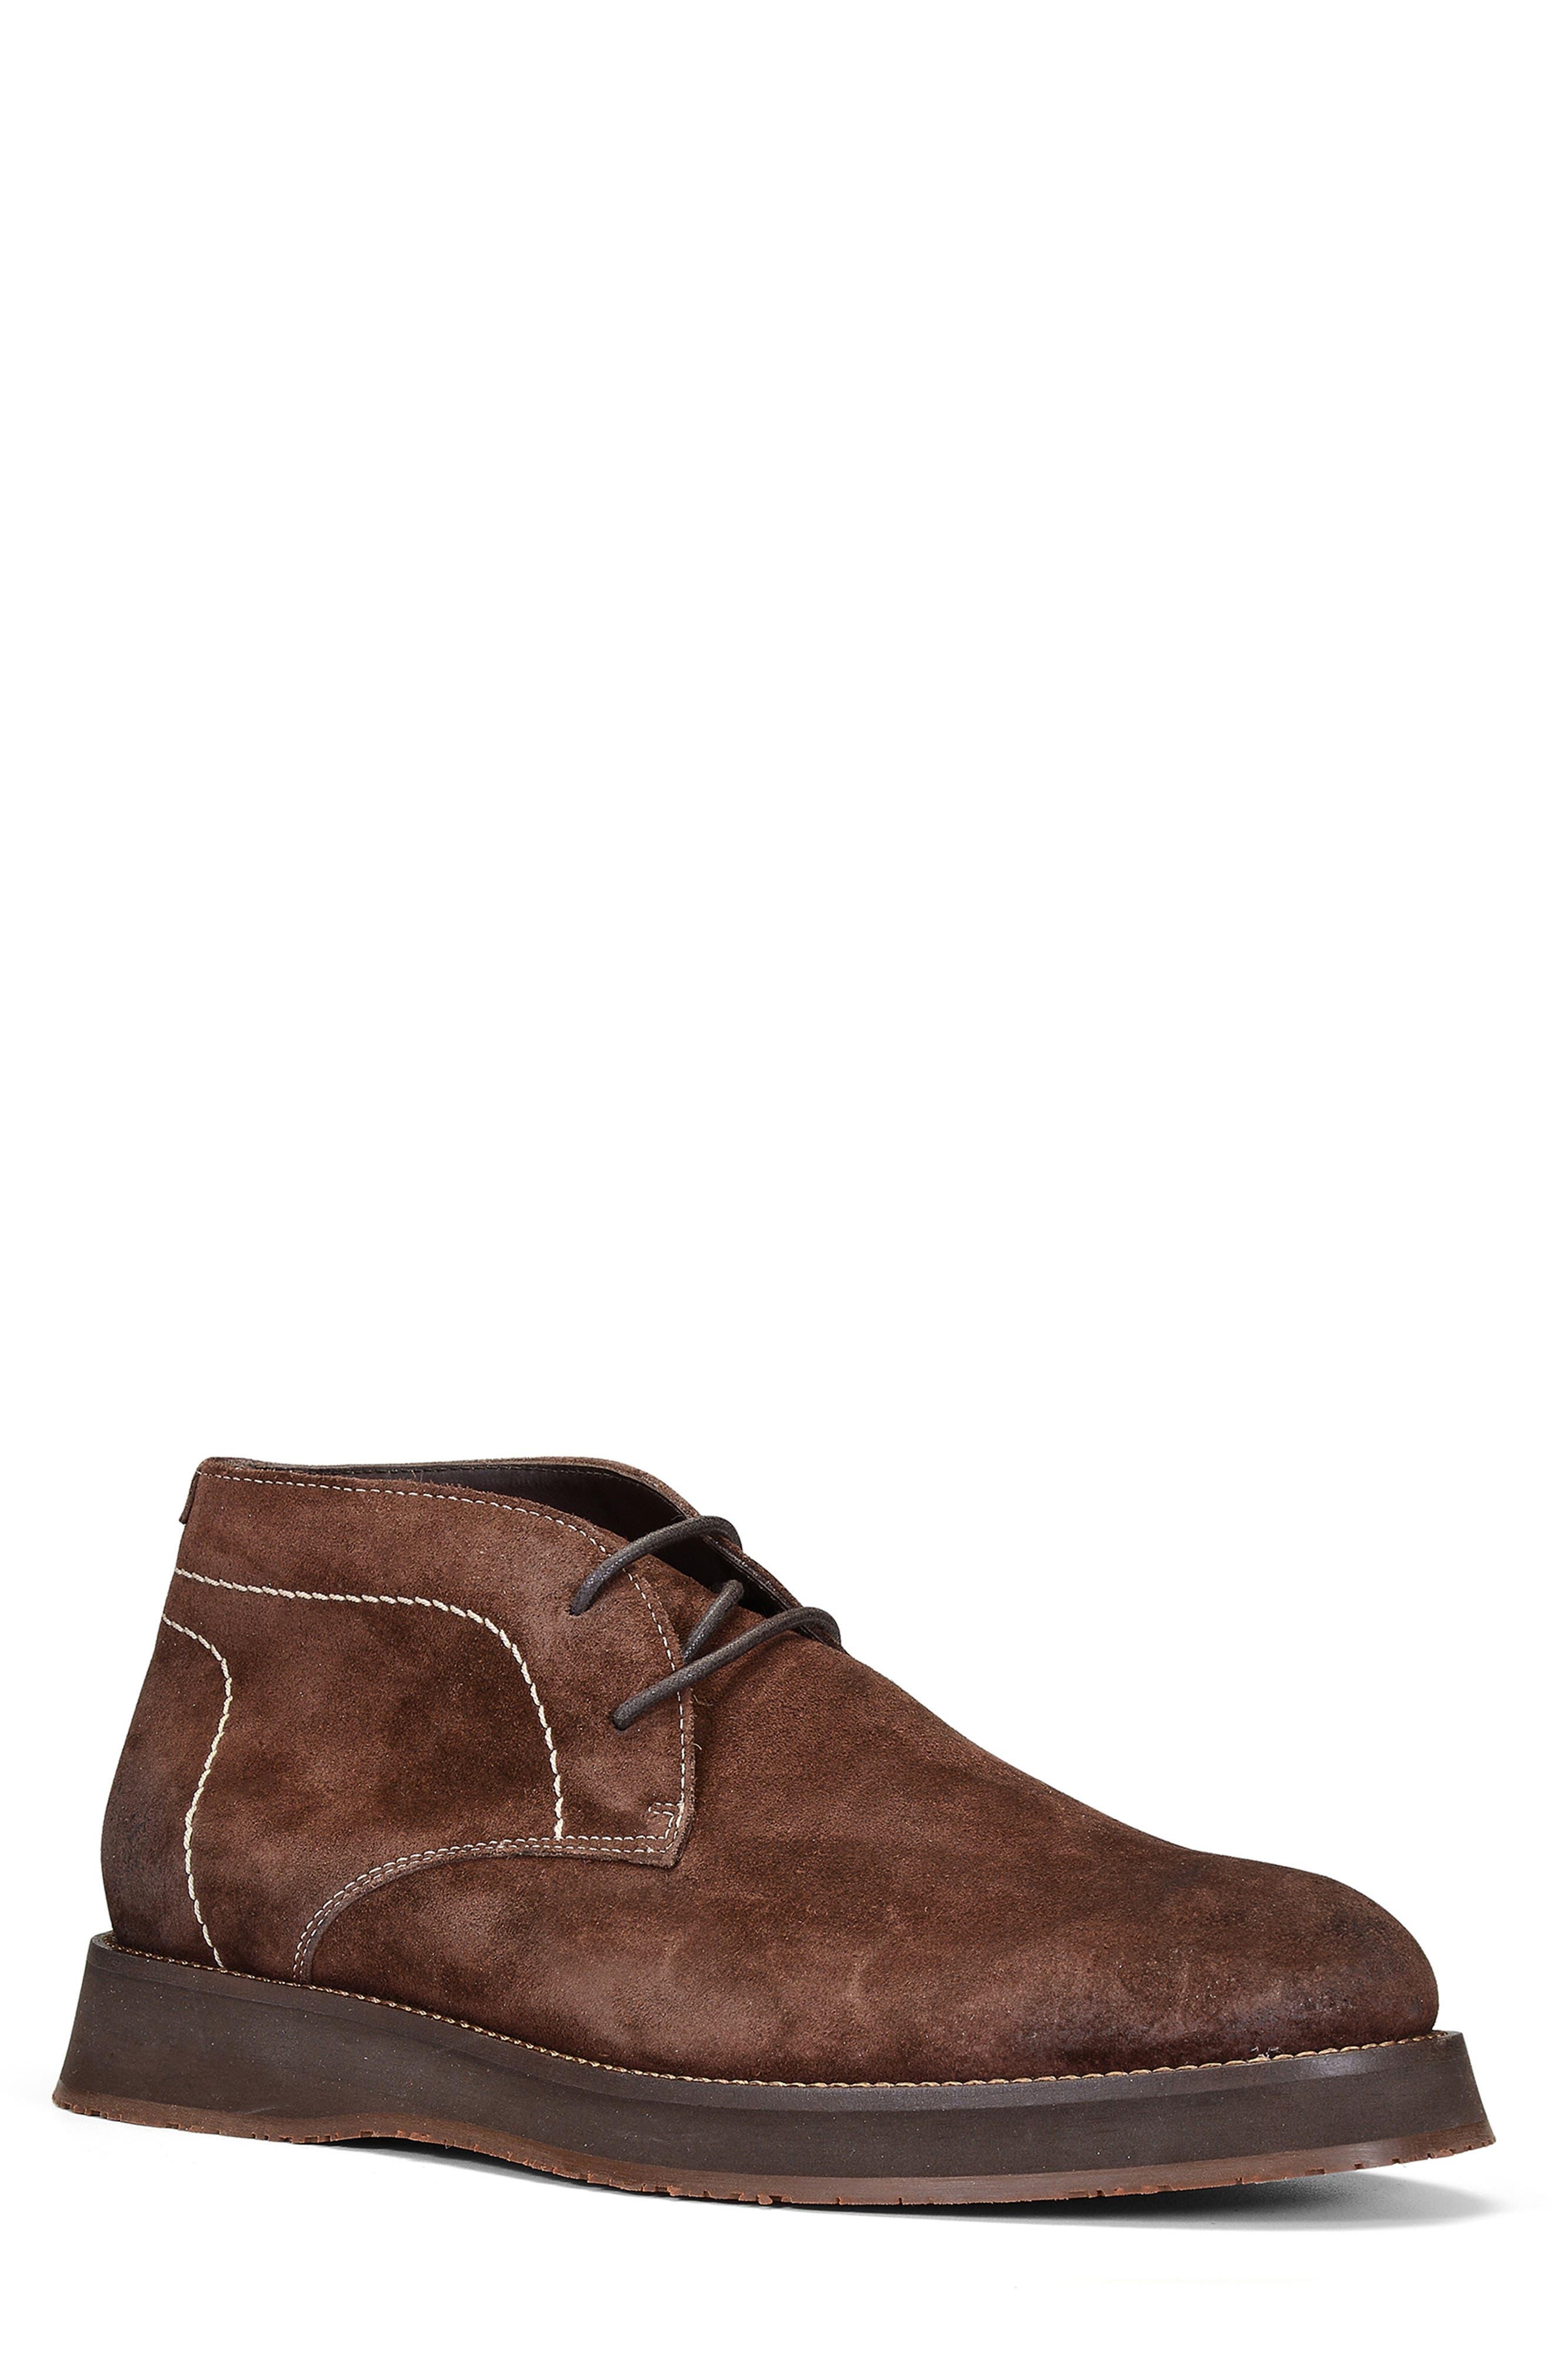 Hamilton Chukka Boot